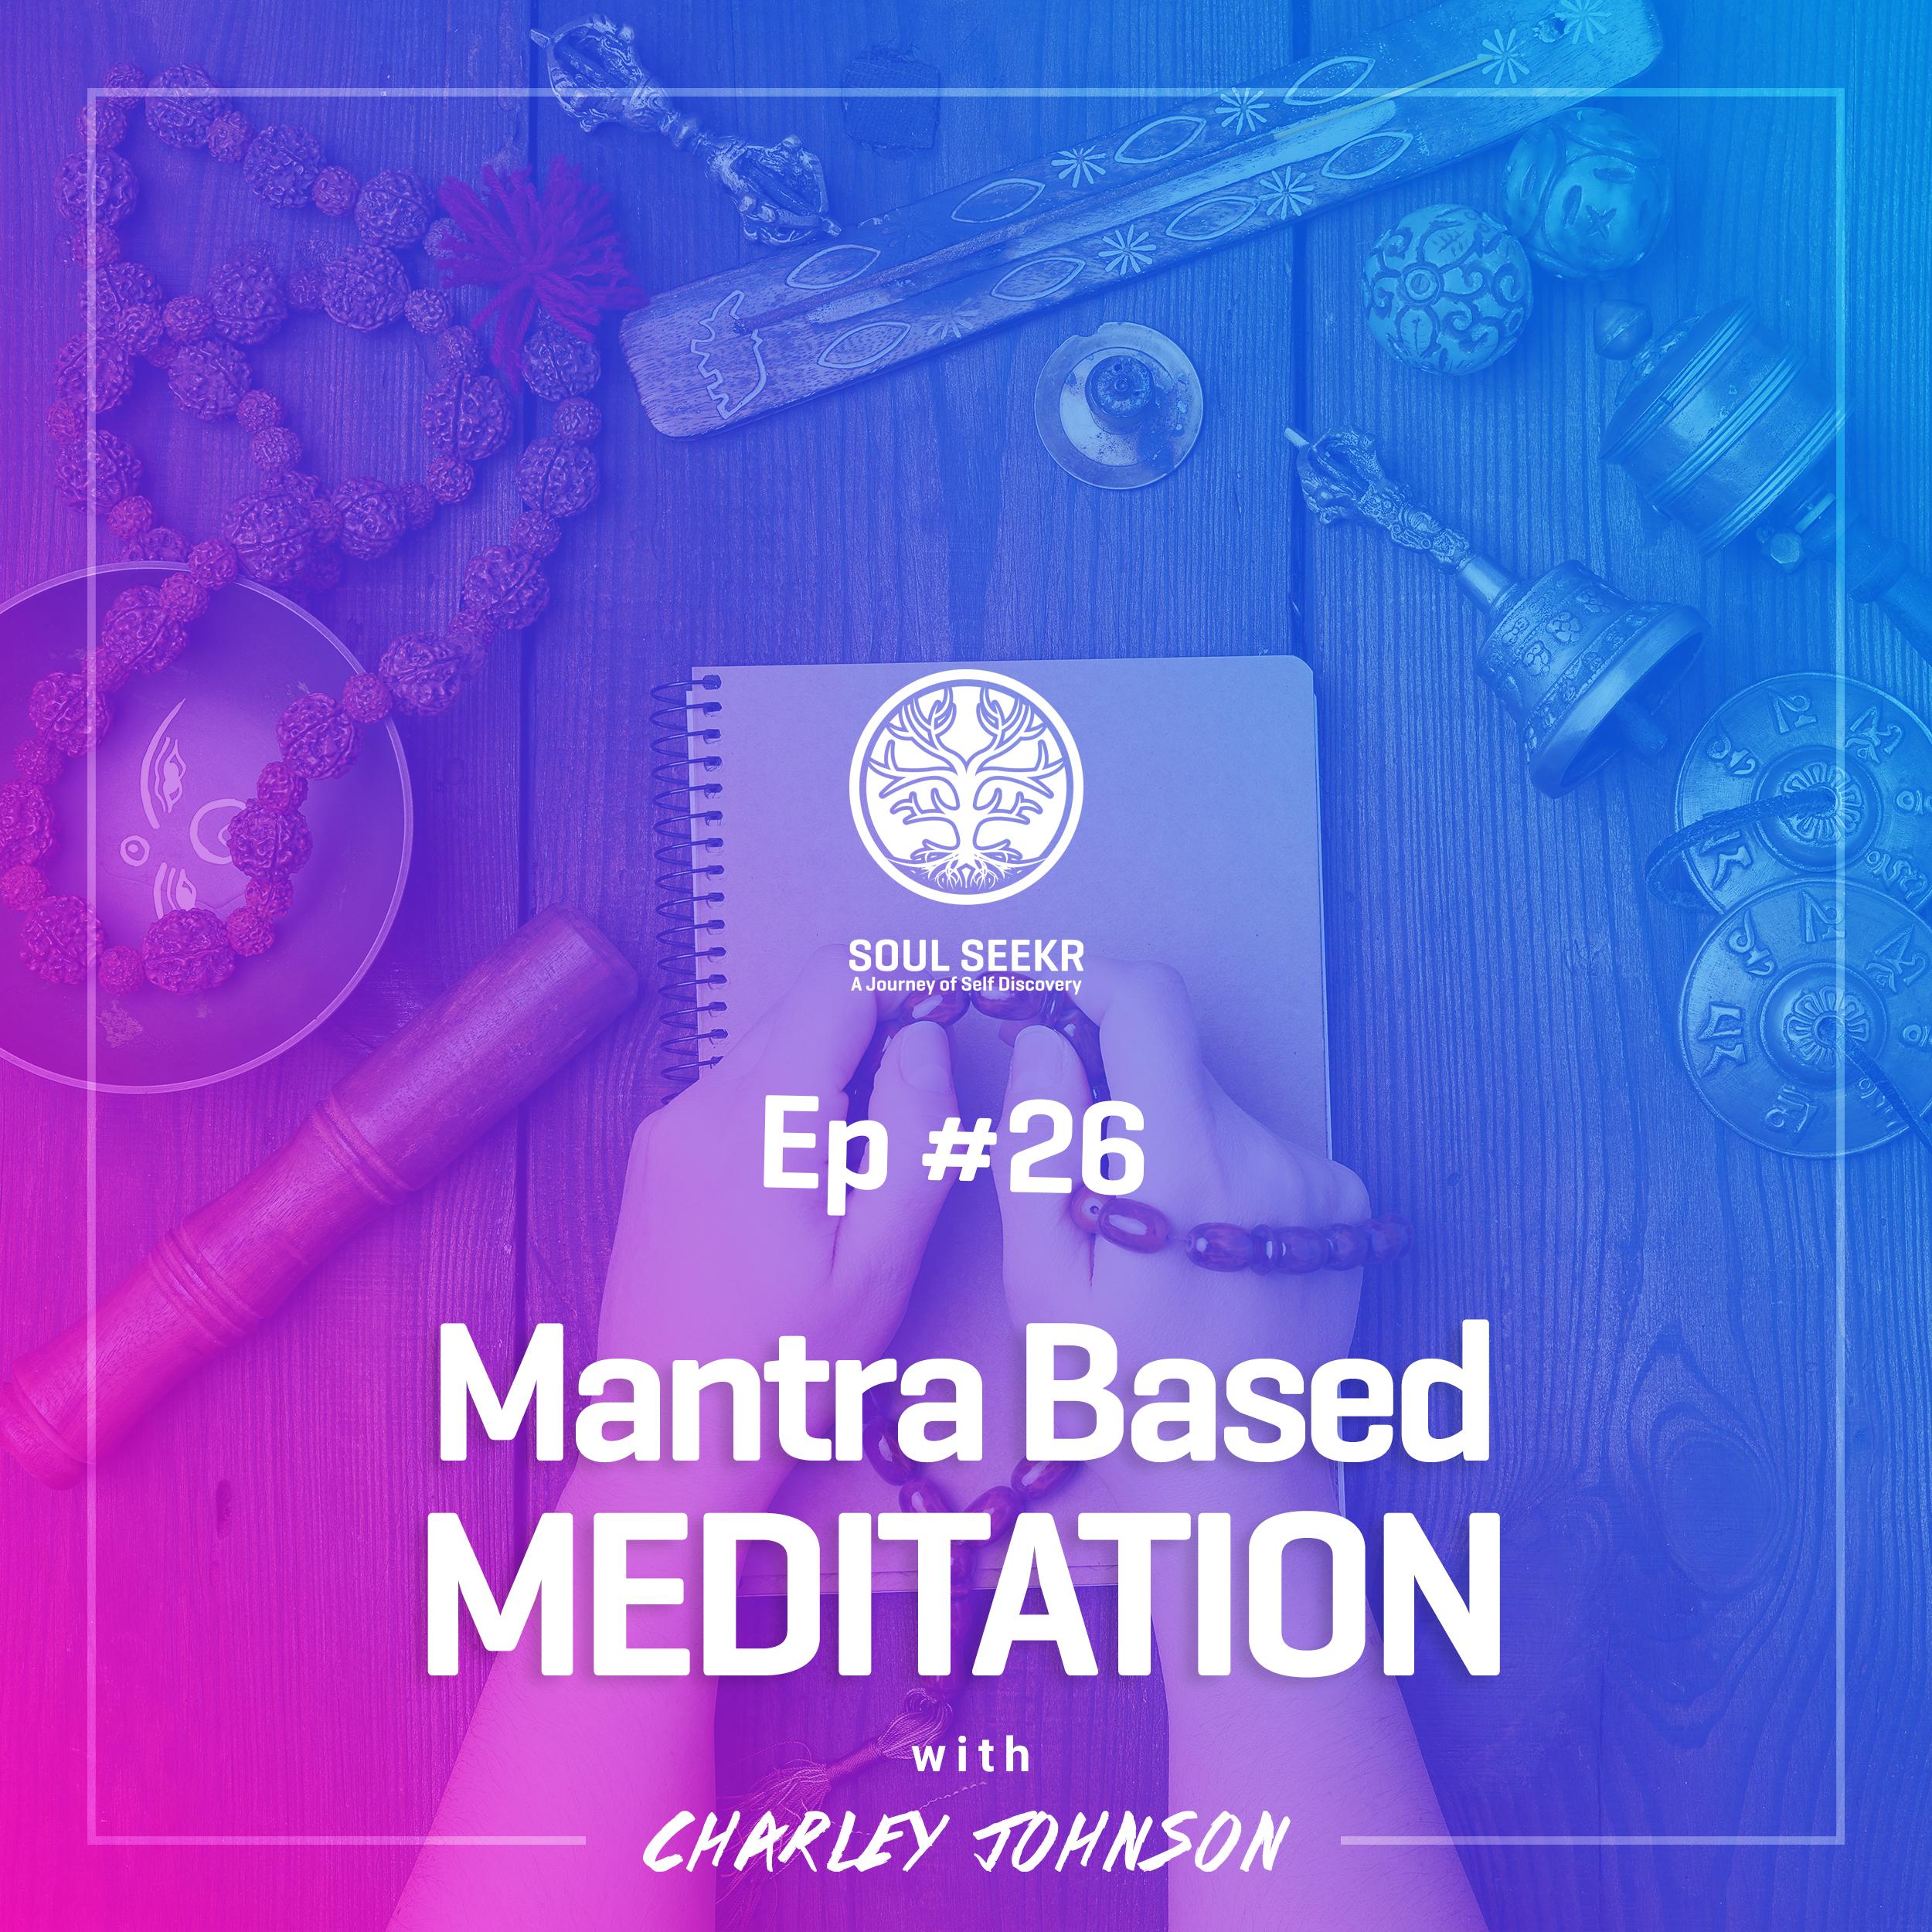 #26: Mantra Based Meditation with Charley Johnson